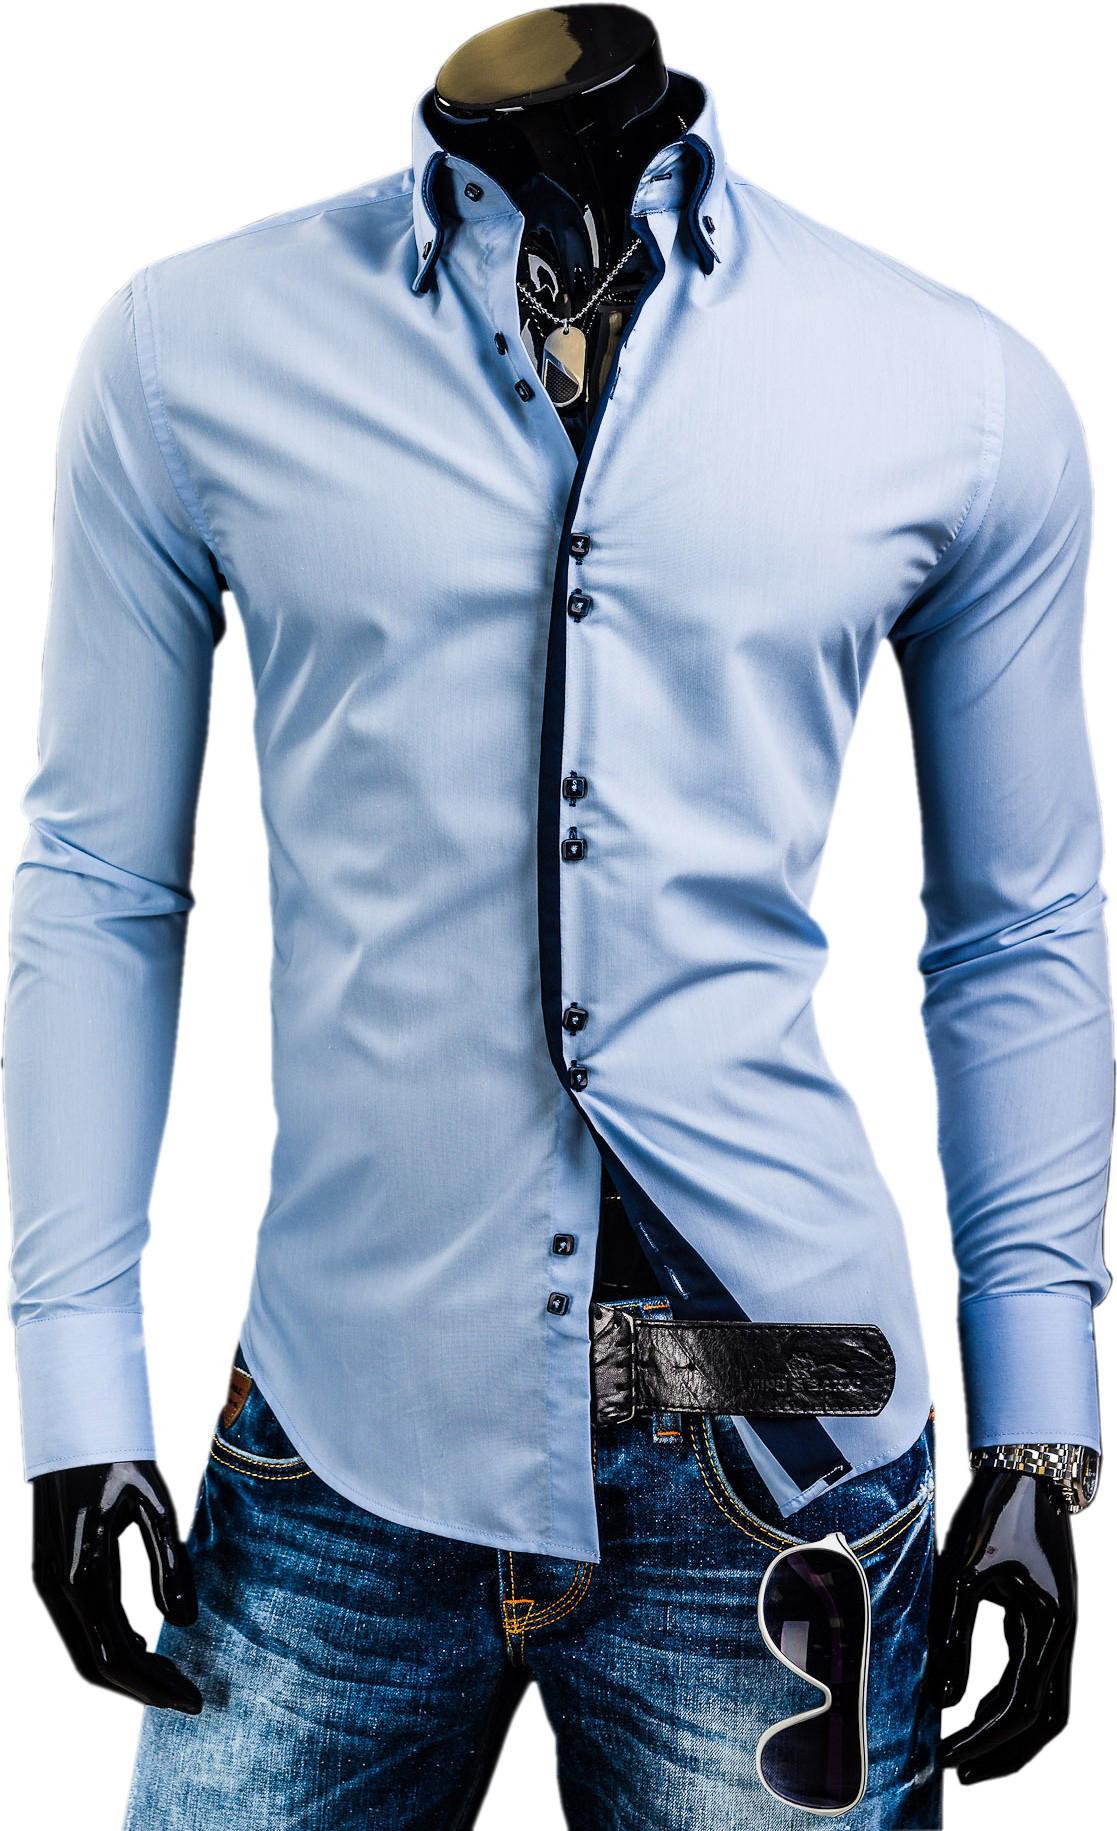 Shirt design for man 2016 - Wholesale 8 Colors Men S G Sleevfashion Trendy Square Buckle Long Sleeved Shirt New Men S Red Shirts Double Collar Dress Shirt Czj821h